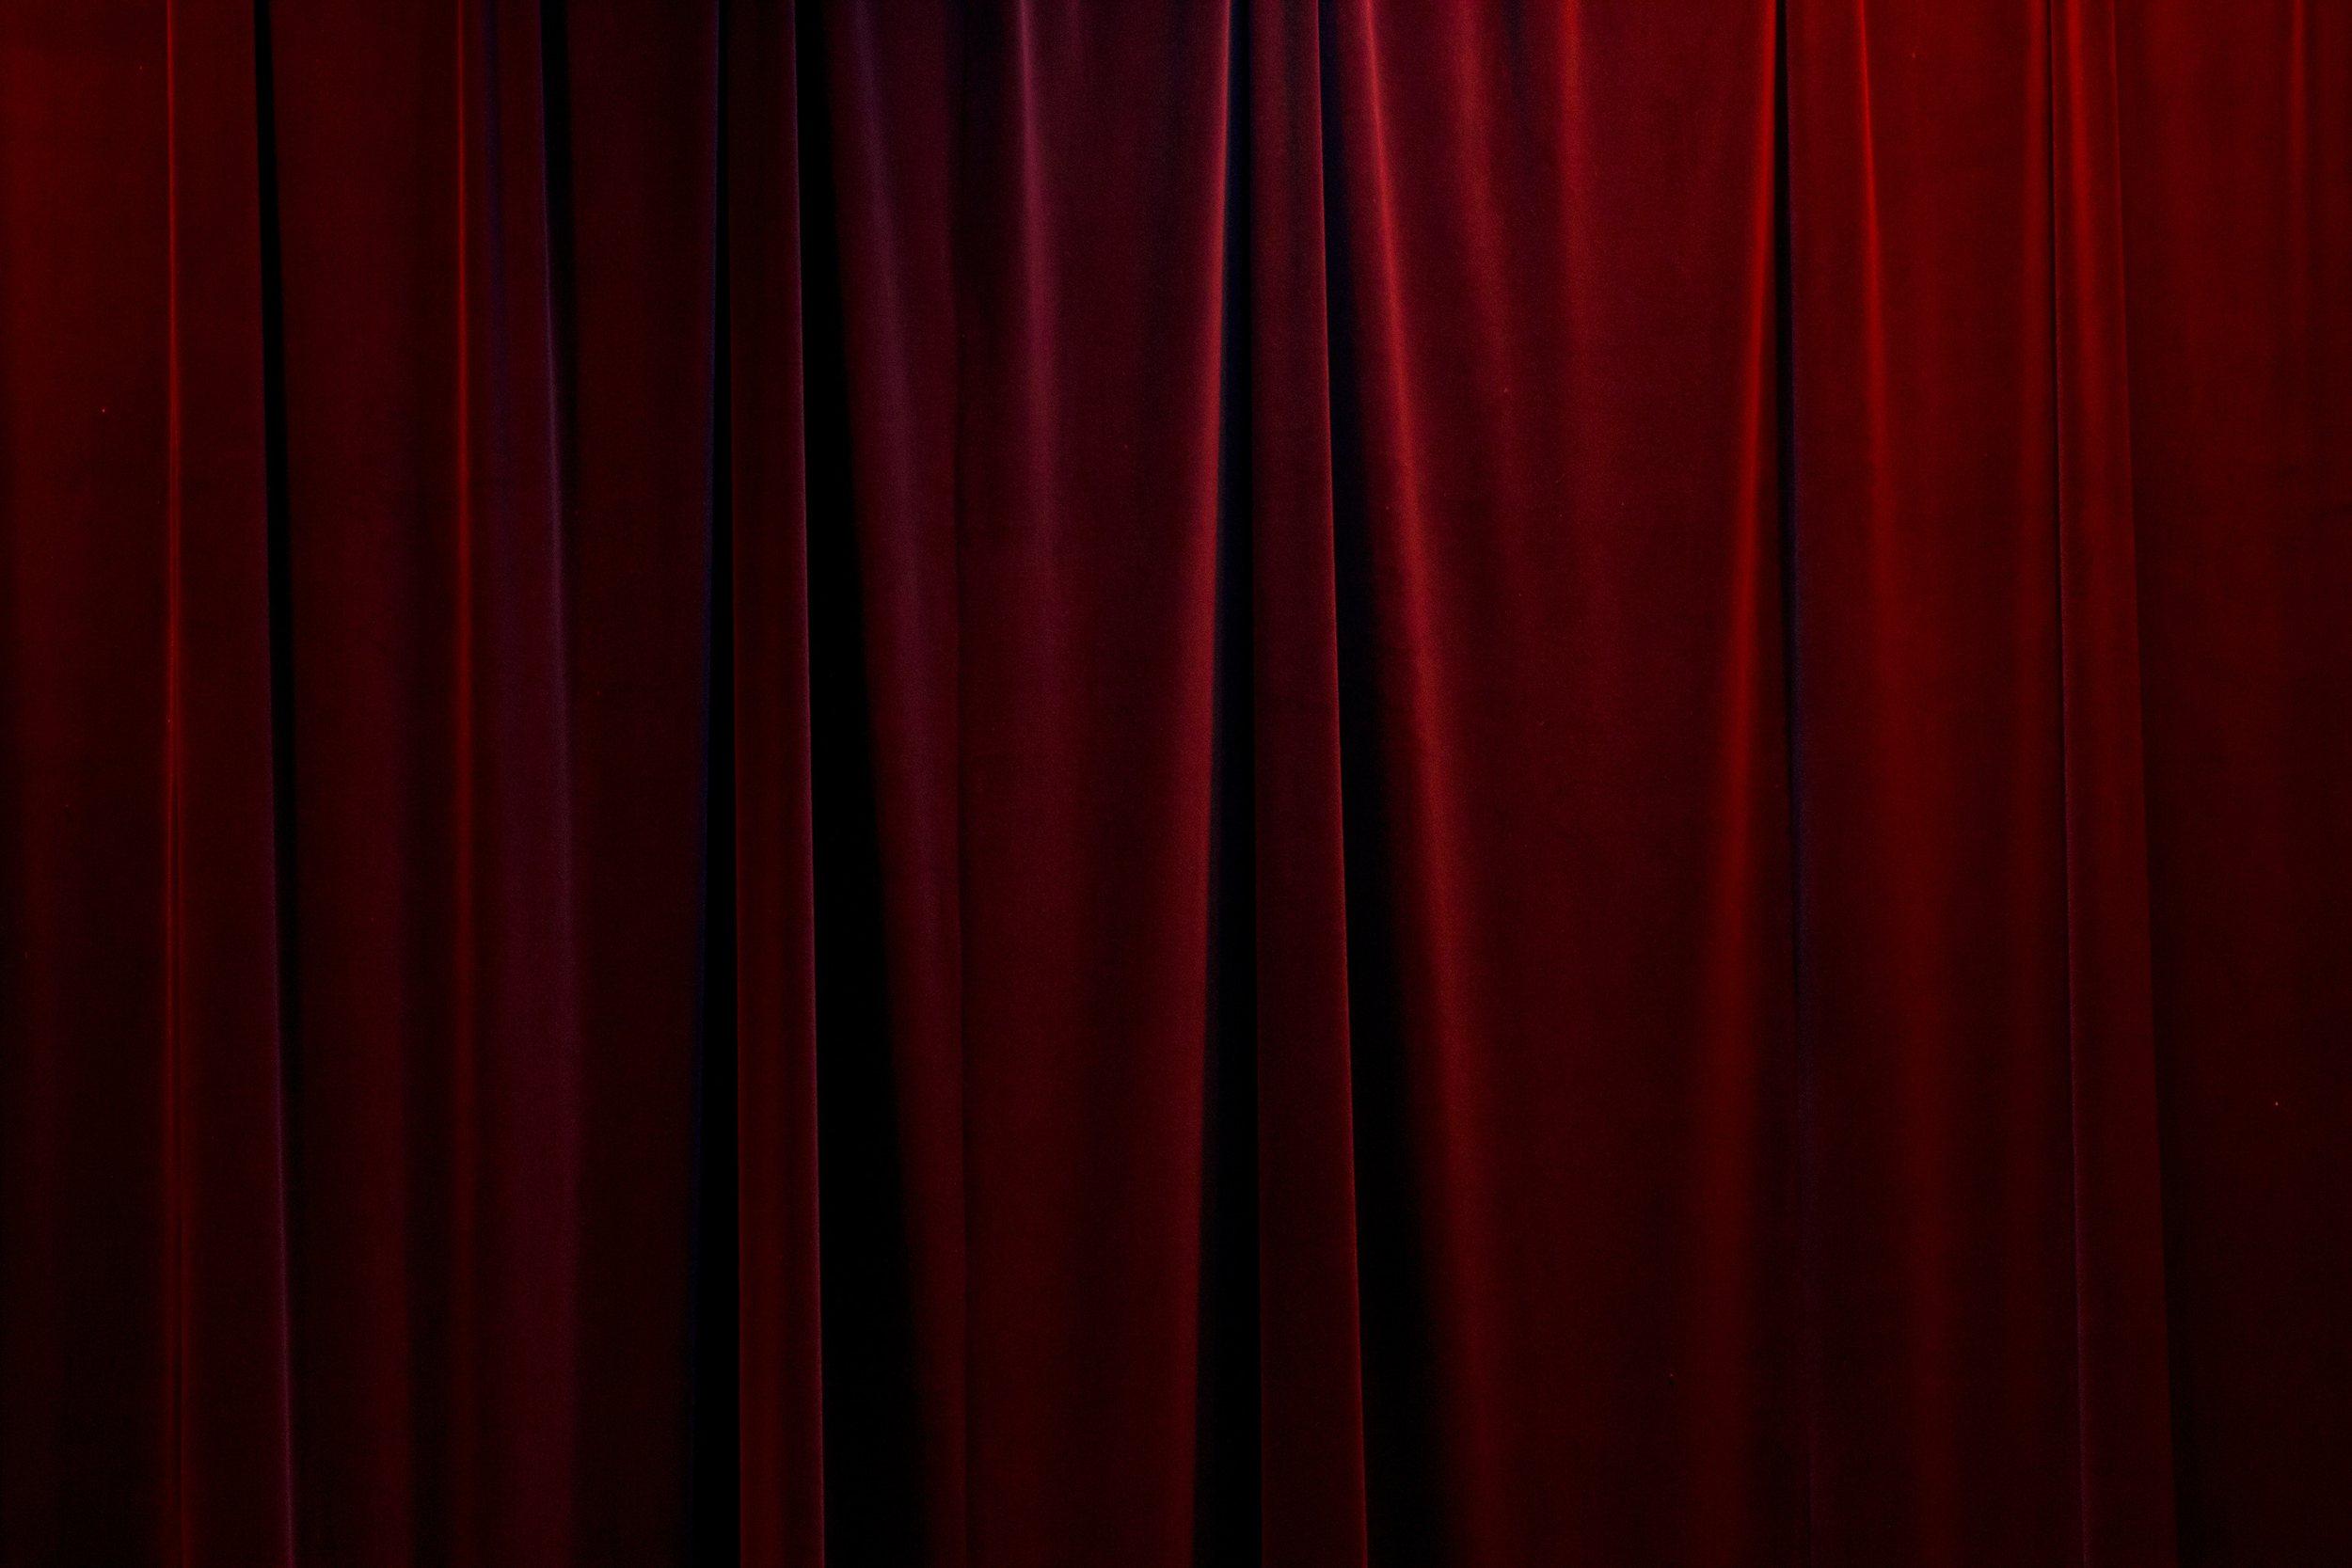 Wisconsin Innovation Awards Red Velvet Curtain